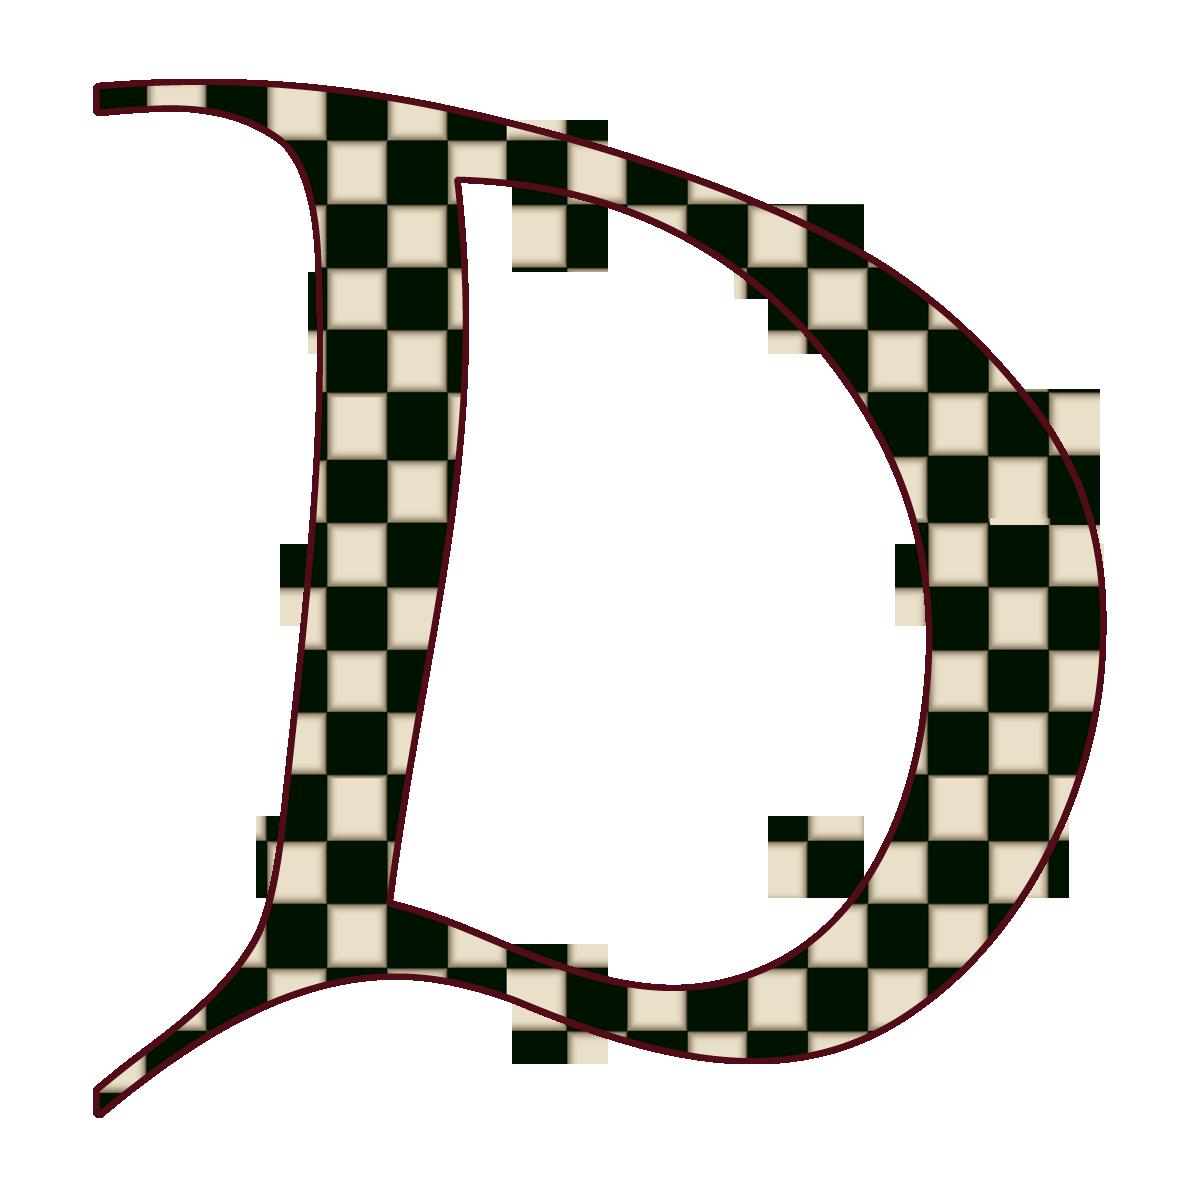 How to scrapbook letters -  Black Checks Free Digital Scrapbook Alphabet Single Letters